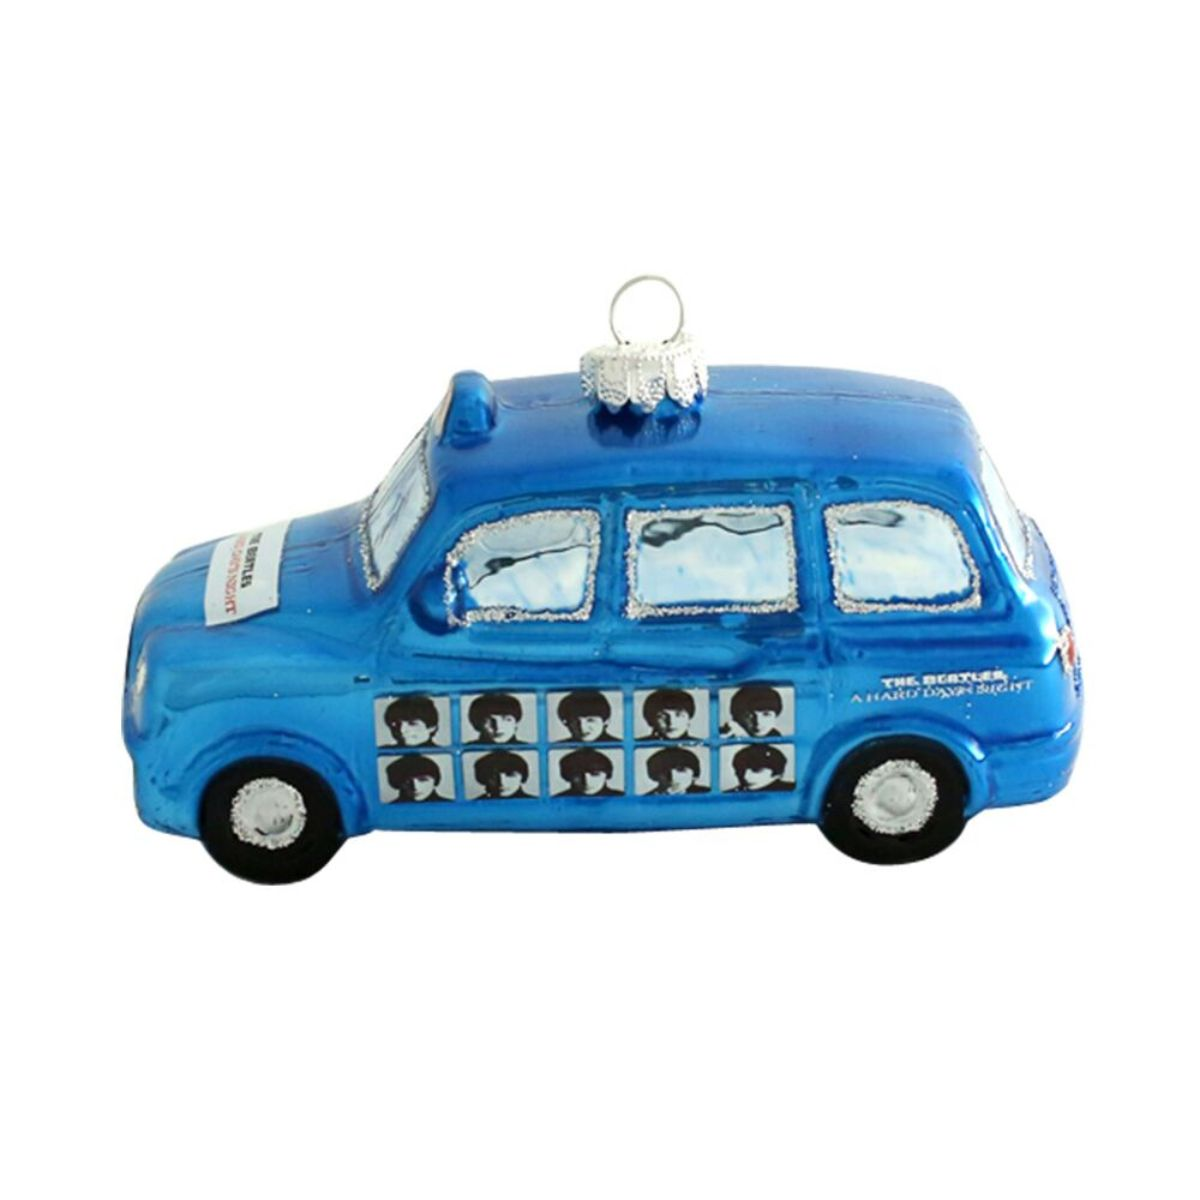 The Beatles Blue London Taxi Ornament